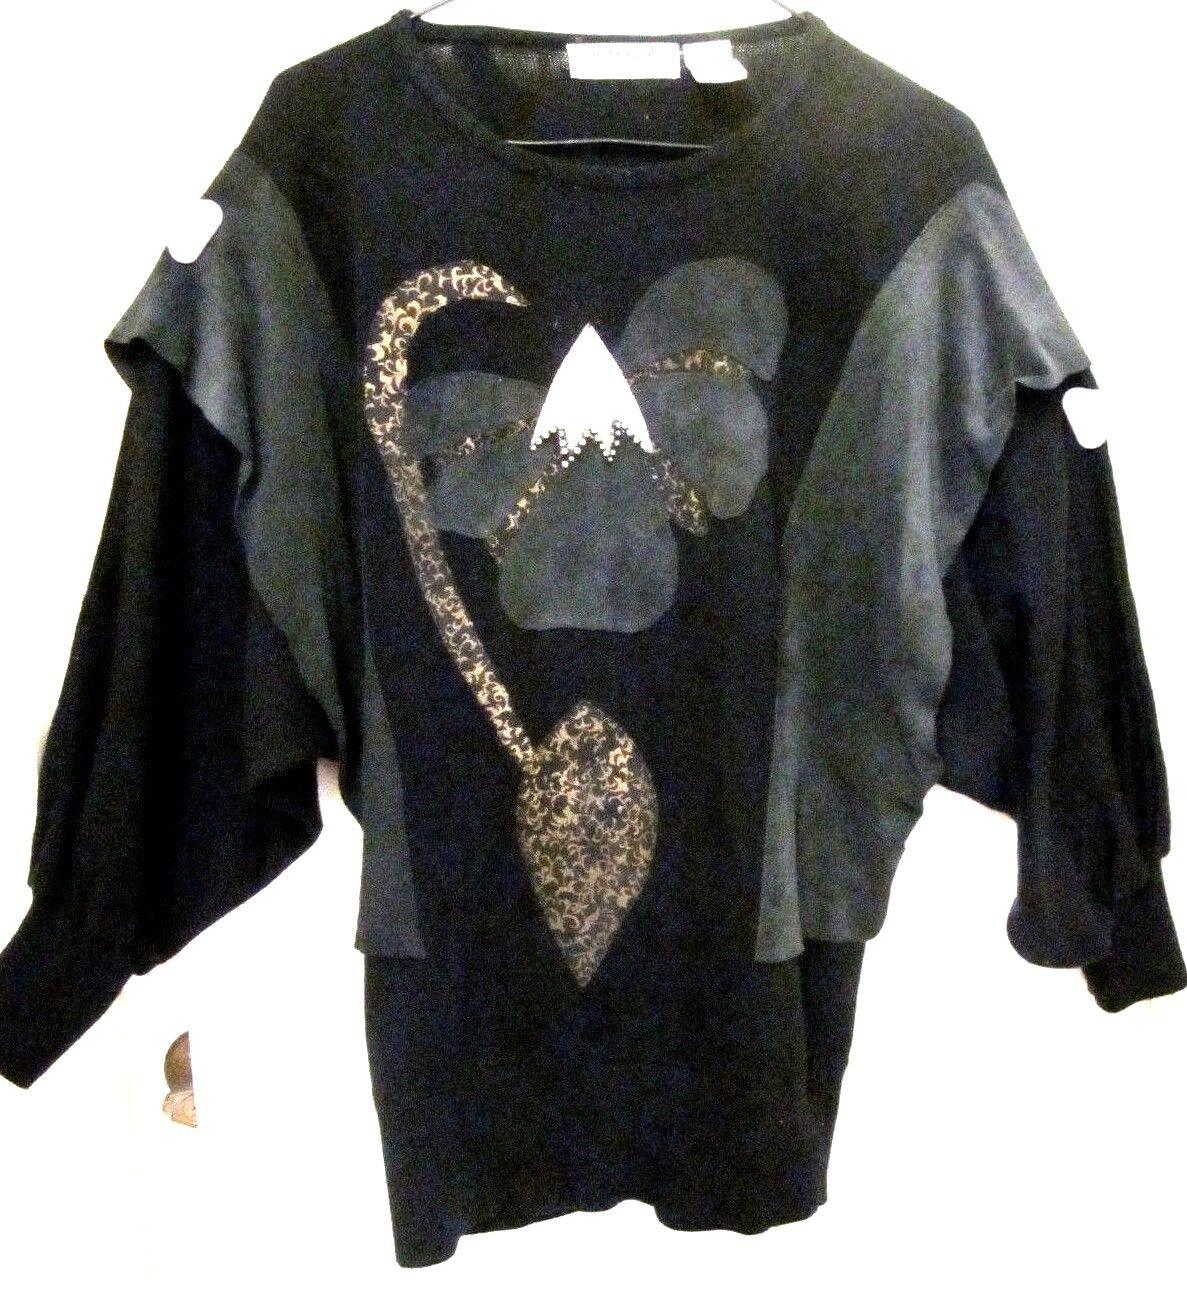 Vtg Adriano by Fatigati daMänner Sweater Crystals Leather Embelished oben Medium